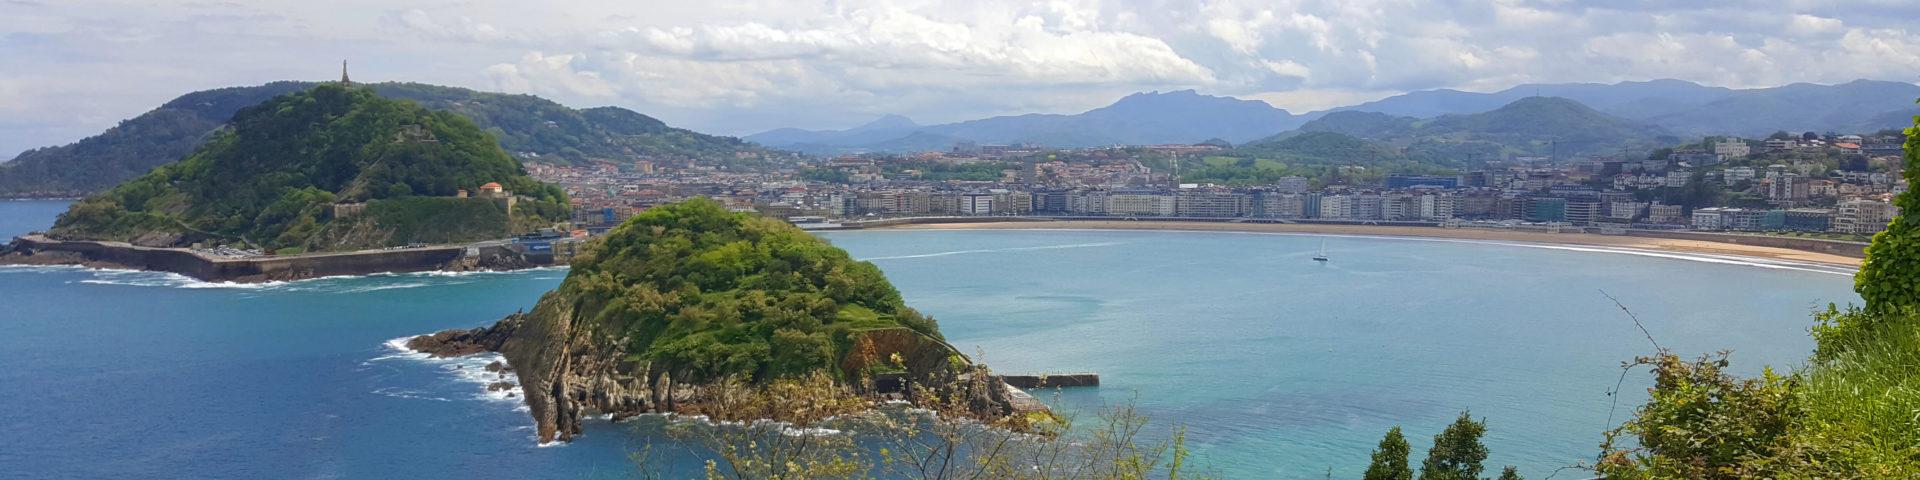 San Sebastian photo - view from solo climb to monte Igueldo